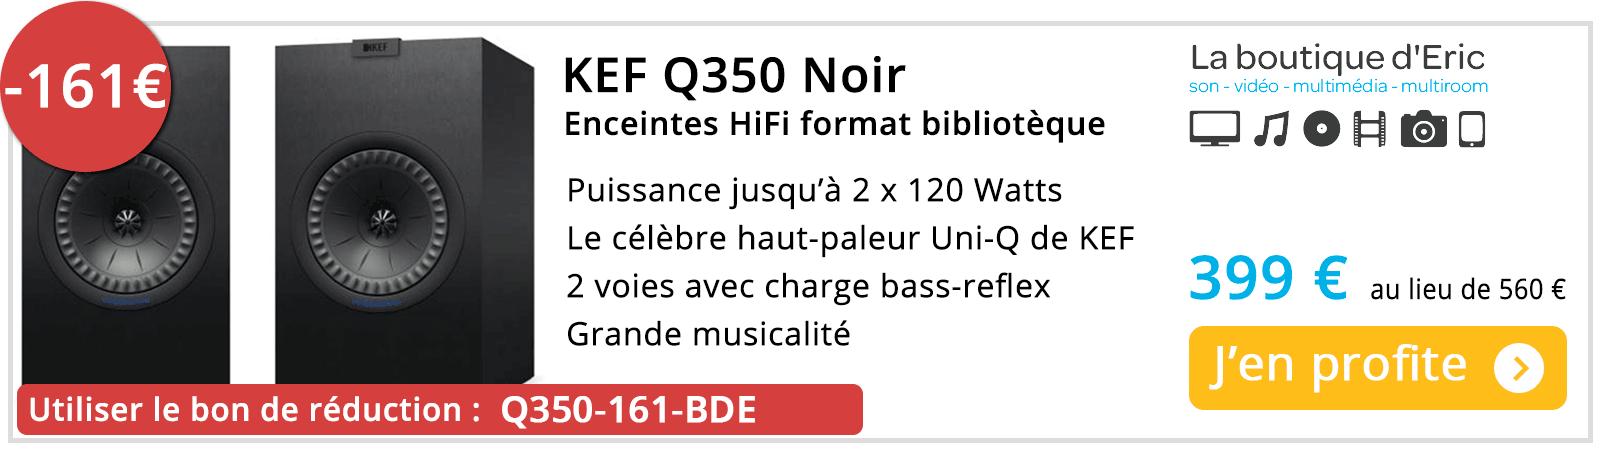 Promo enceintes HiFi KEF Q350